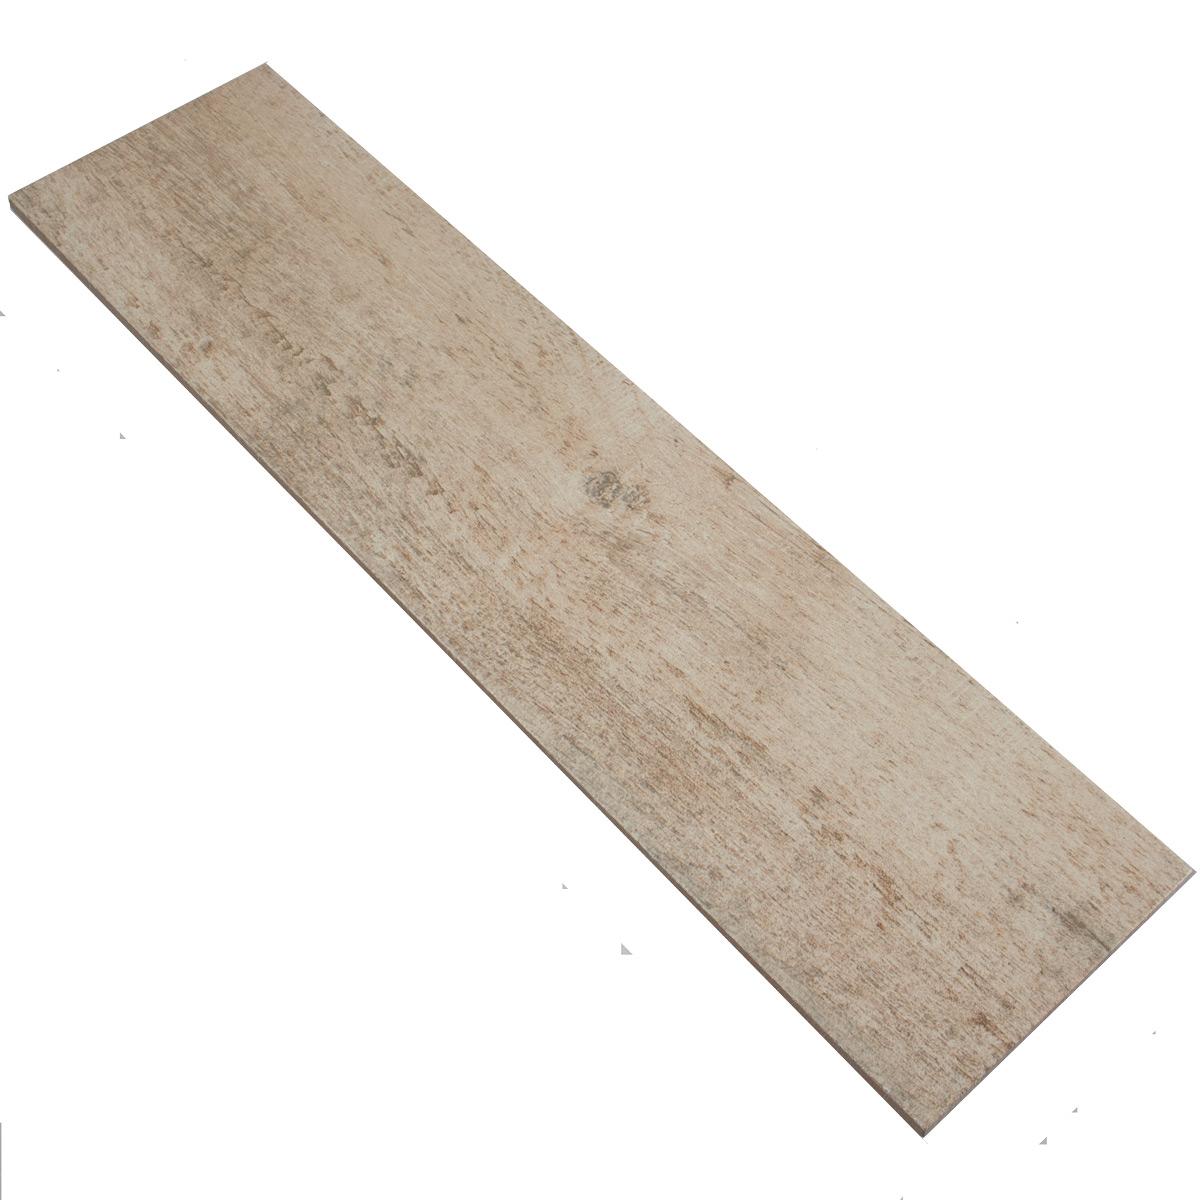 Bien Legend Boden-/Wandfliese Ivory 15x60 Holzoptik Lappato